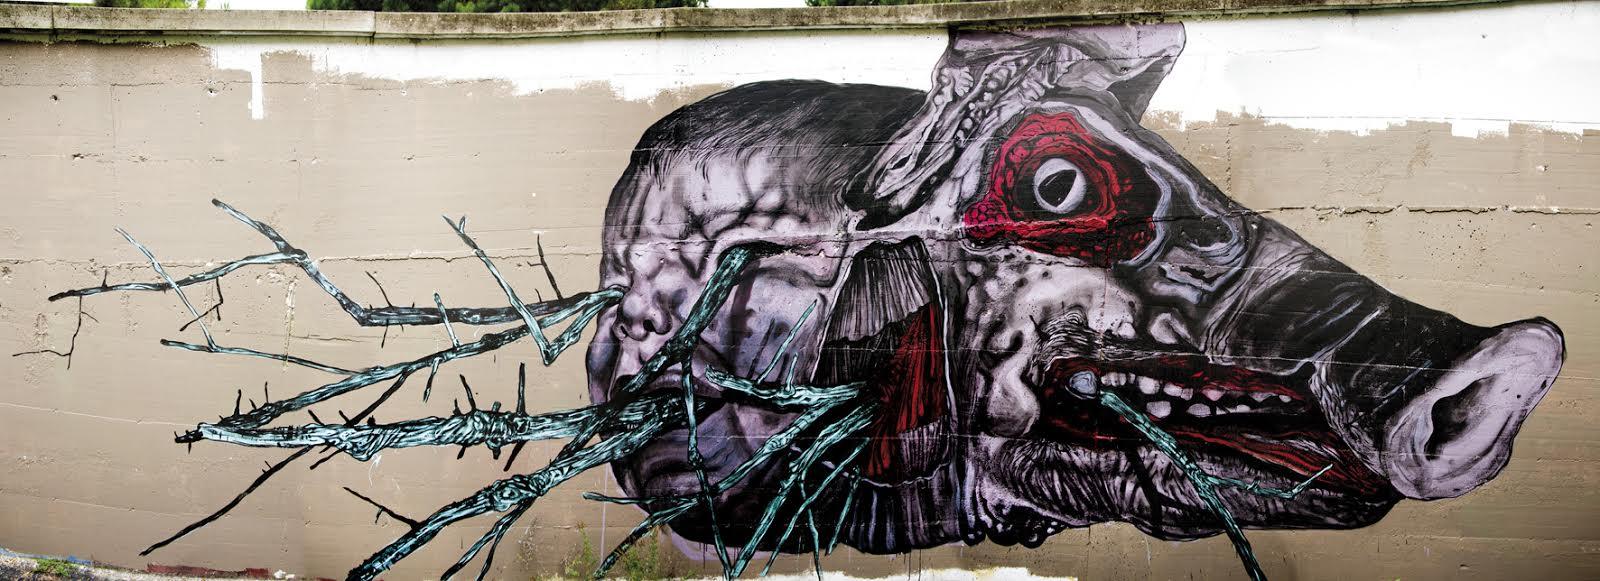 nicola-alessandrini-new-mural-in-macerata-01